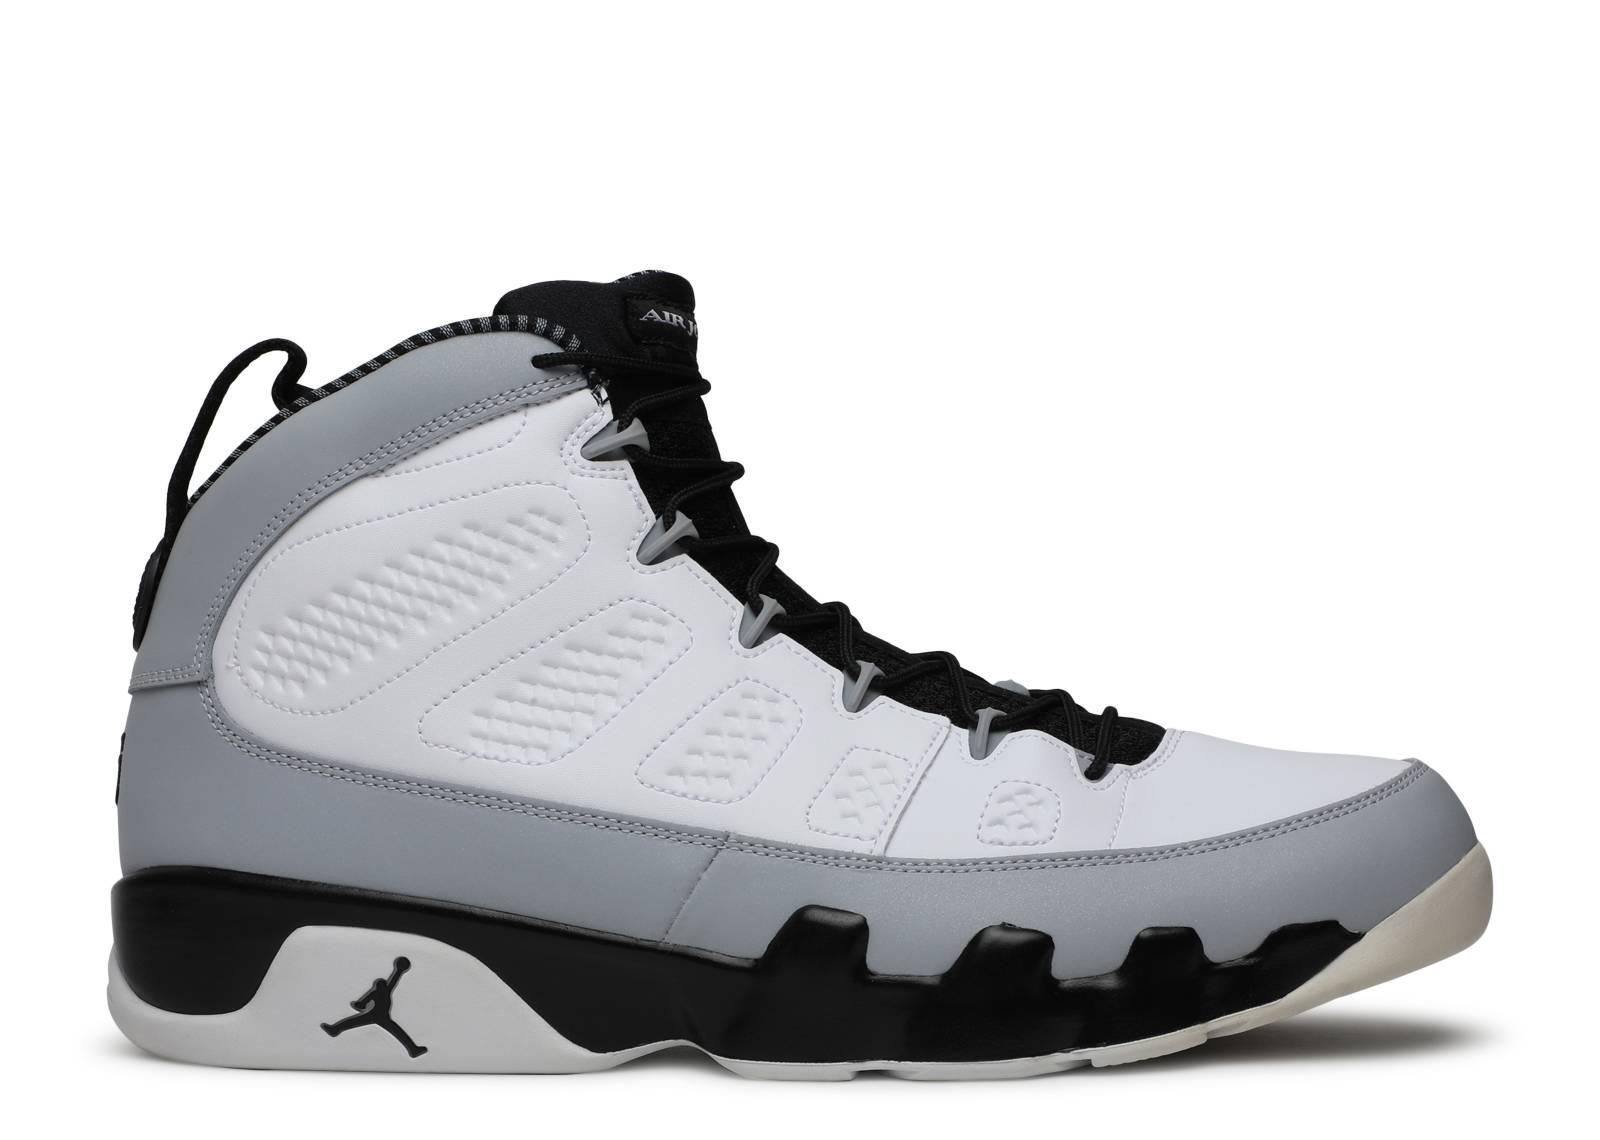 d5cd6699f4d8 Air Jordan 9 Retro